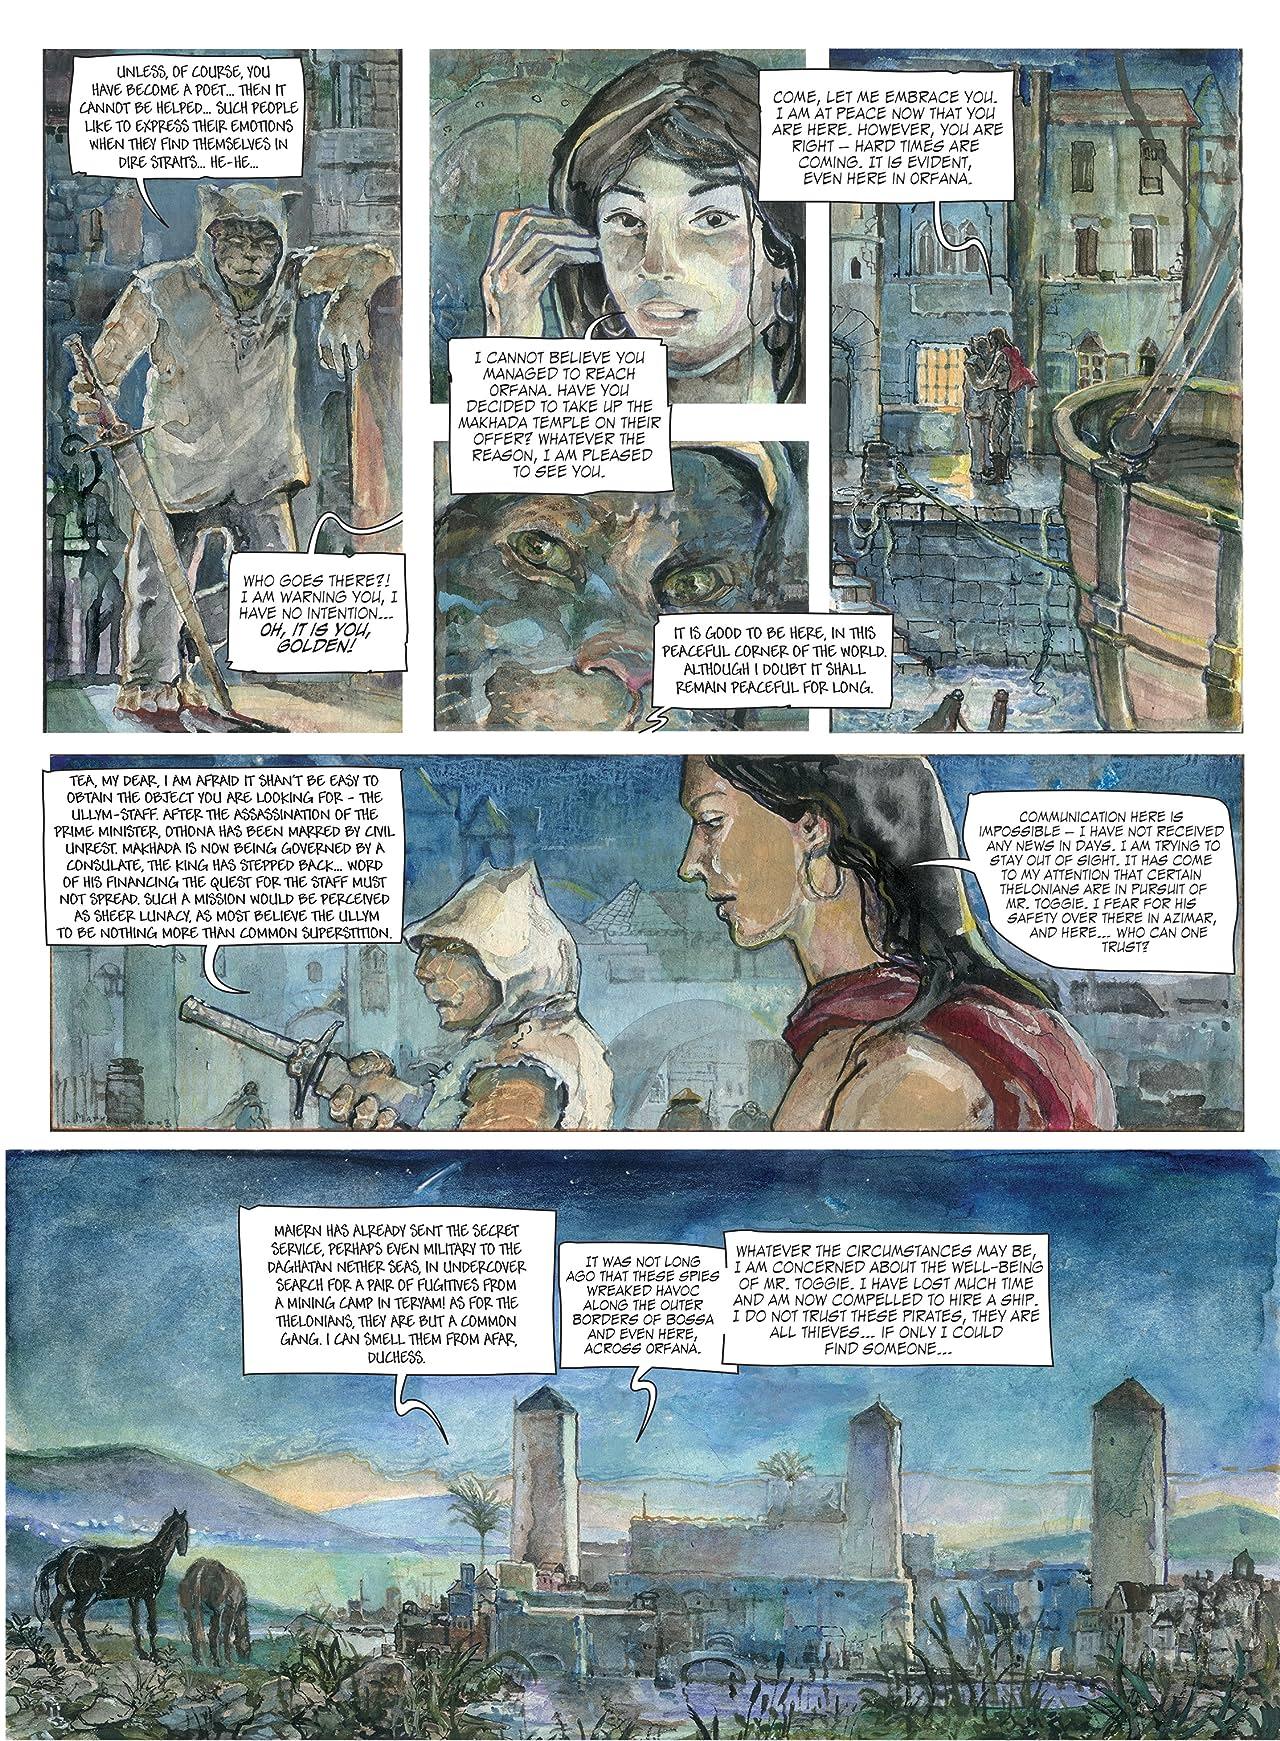 Vizilsan Vol. 1: Blue Rabbit's Crystal